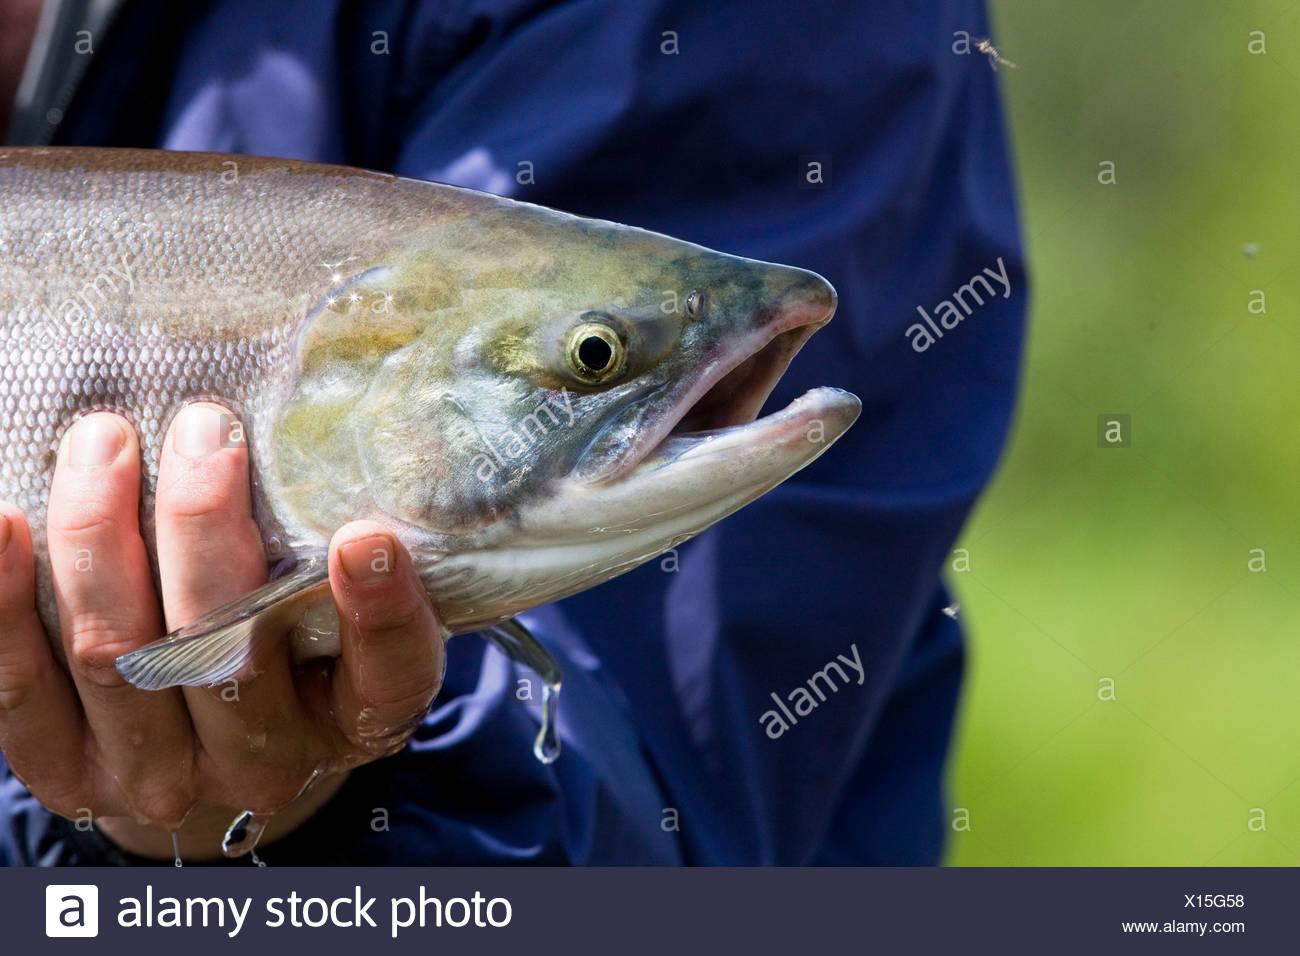 A fly fisherman holds up a sockeye salmon caught on the Koktuli River in Bristol Bay, Southwest Alaska, Summer Stock Photo